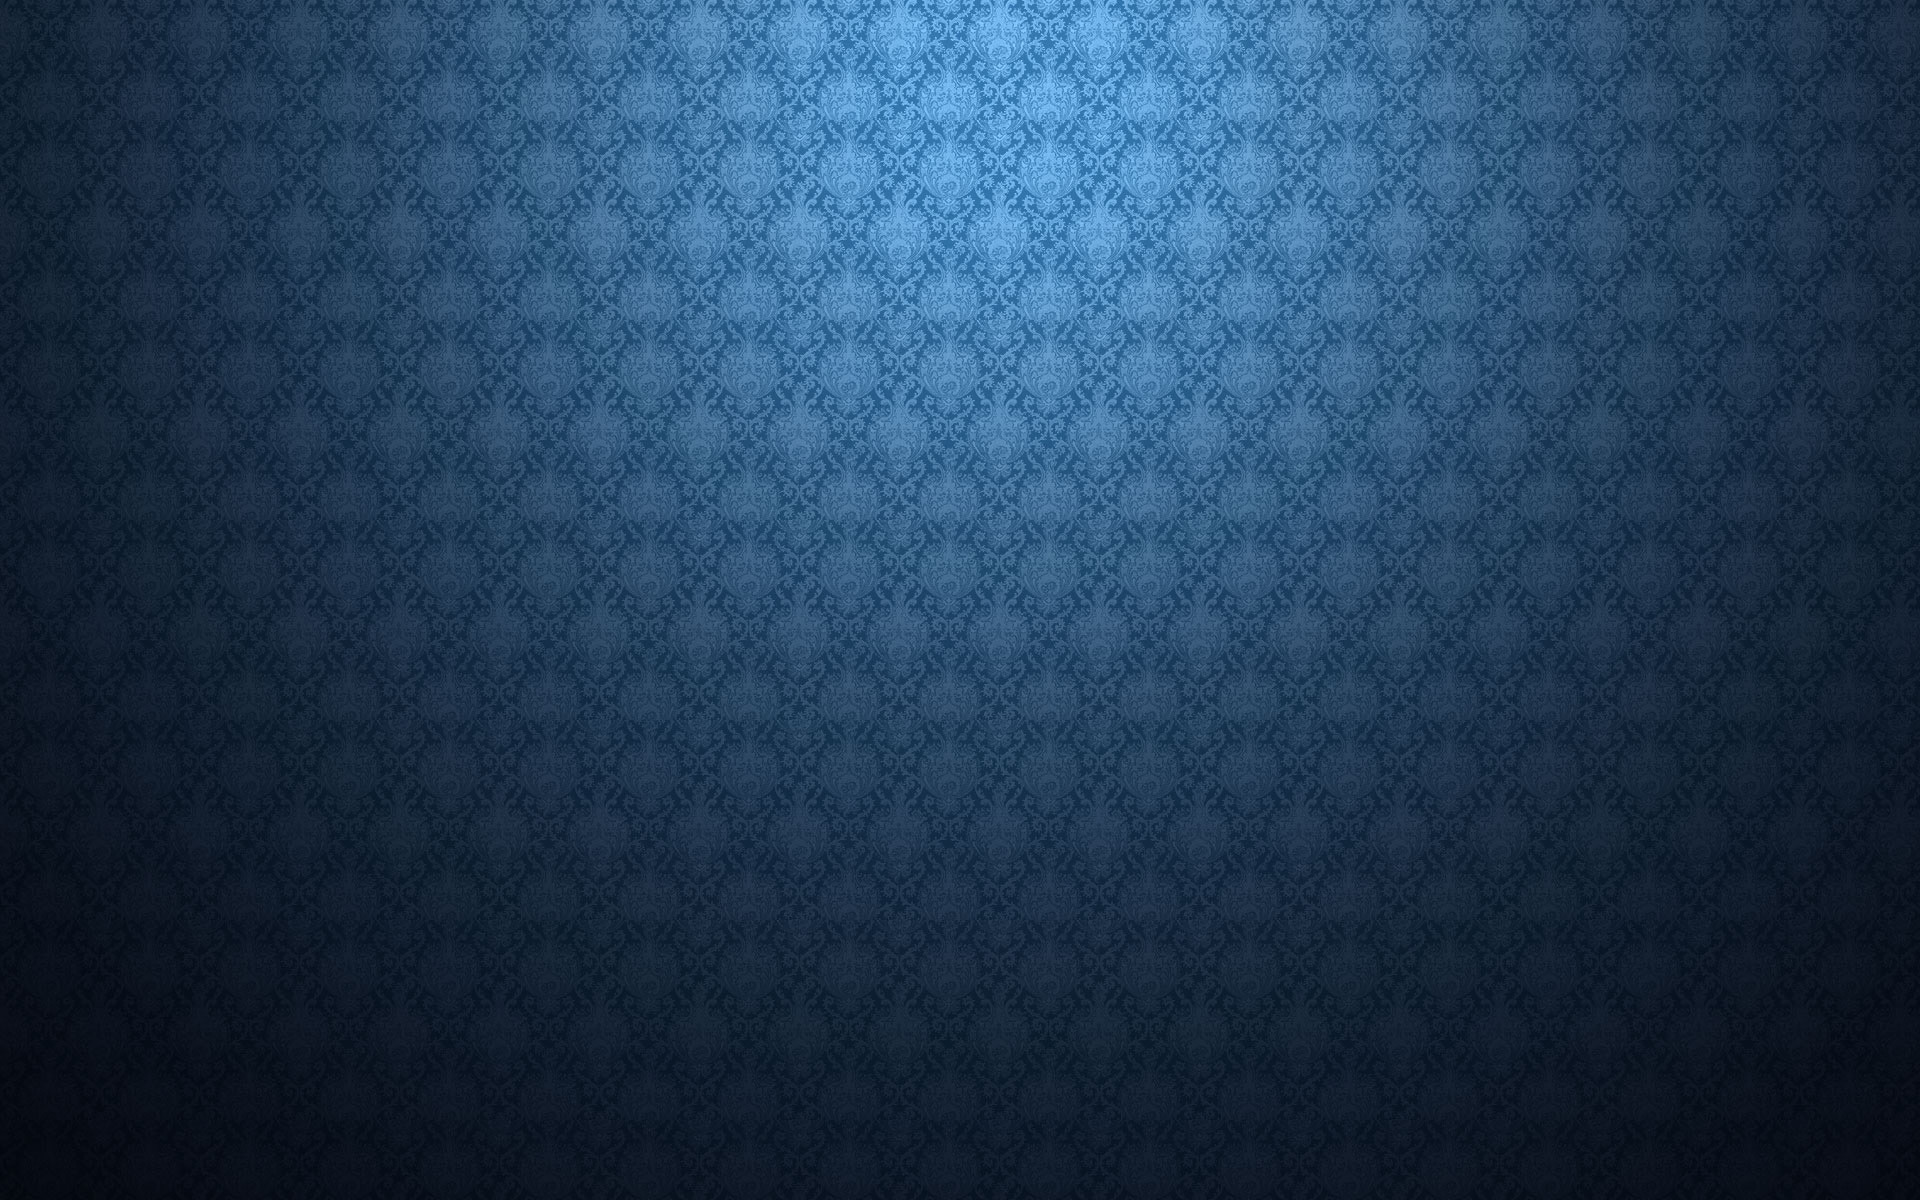 Cool Blue WallpapersHD Wallpapers 1920×1200 Blue Wallpapers (34 Wallpapers)  | Adorable Wallpapers